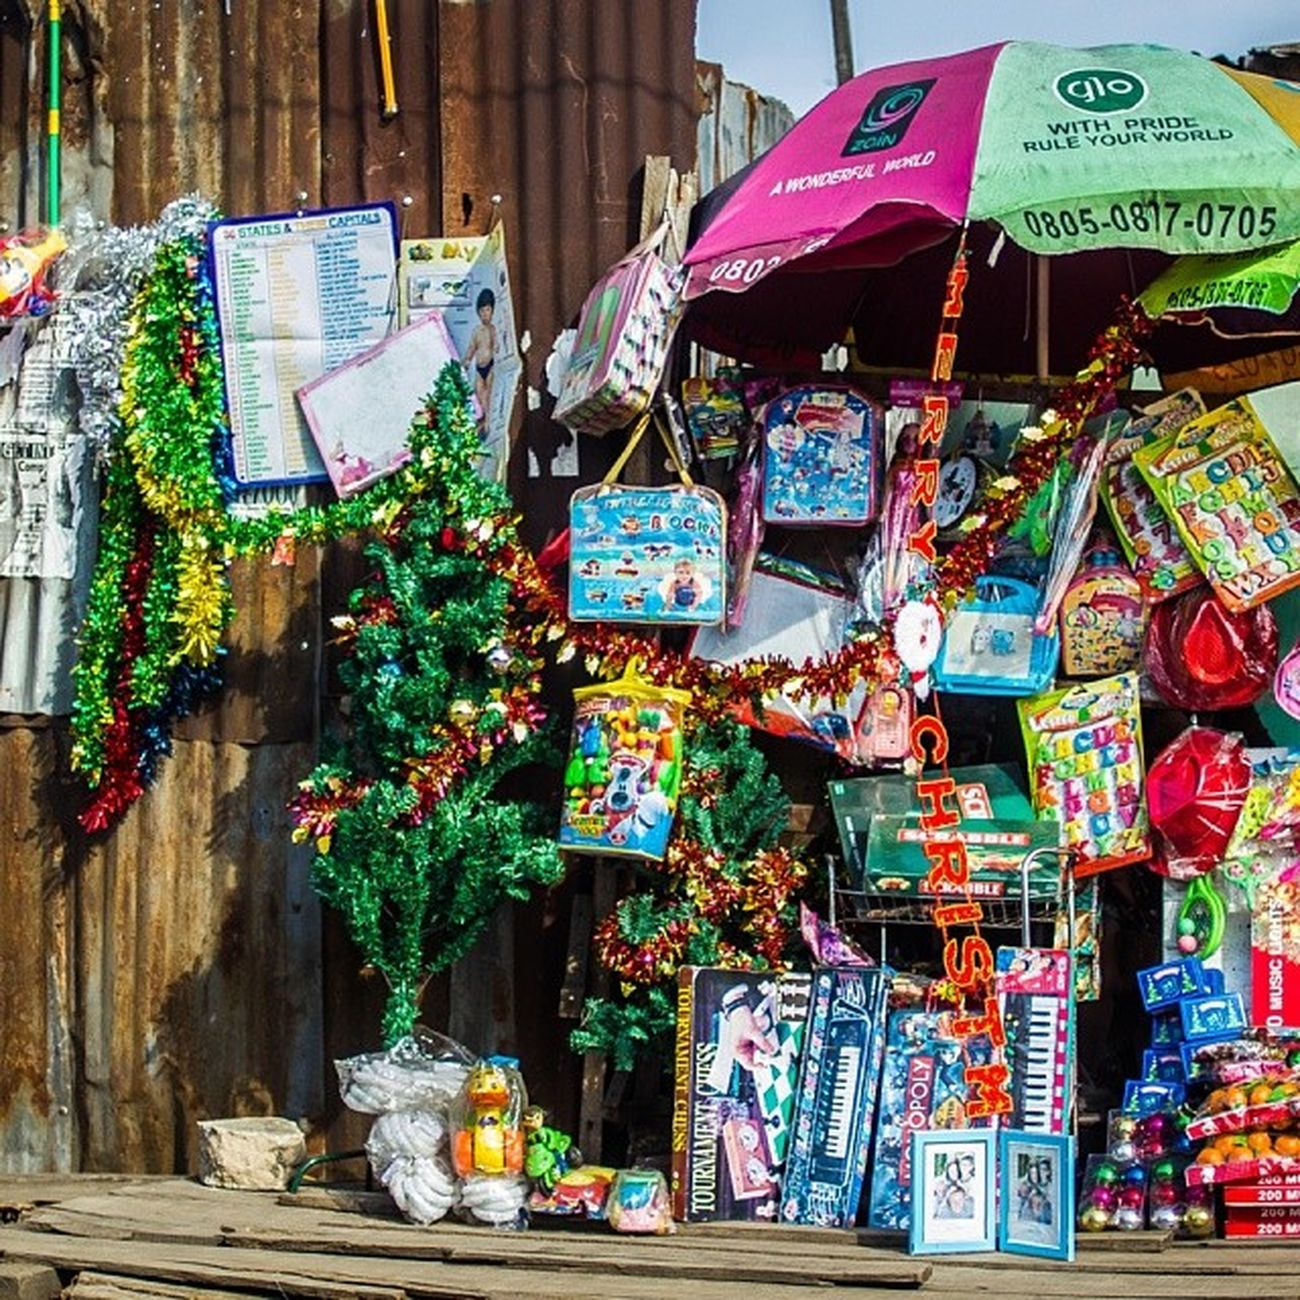 Christmas shops in Lagos . Christmas ChristmasInLagos Lookslikelagos Nigeria streetphotography africa